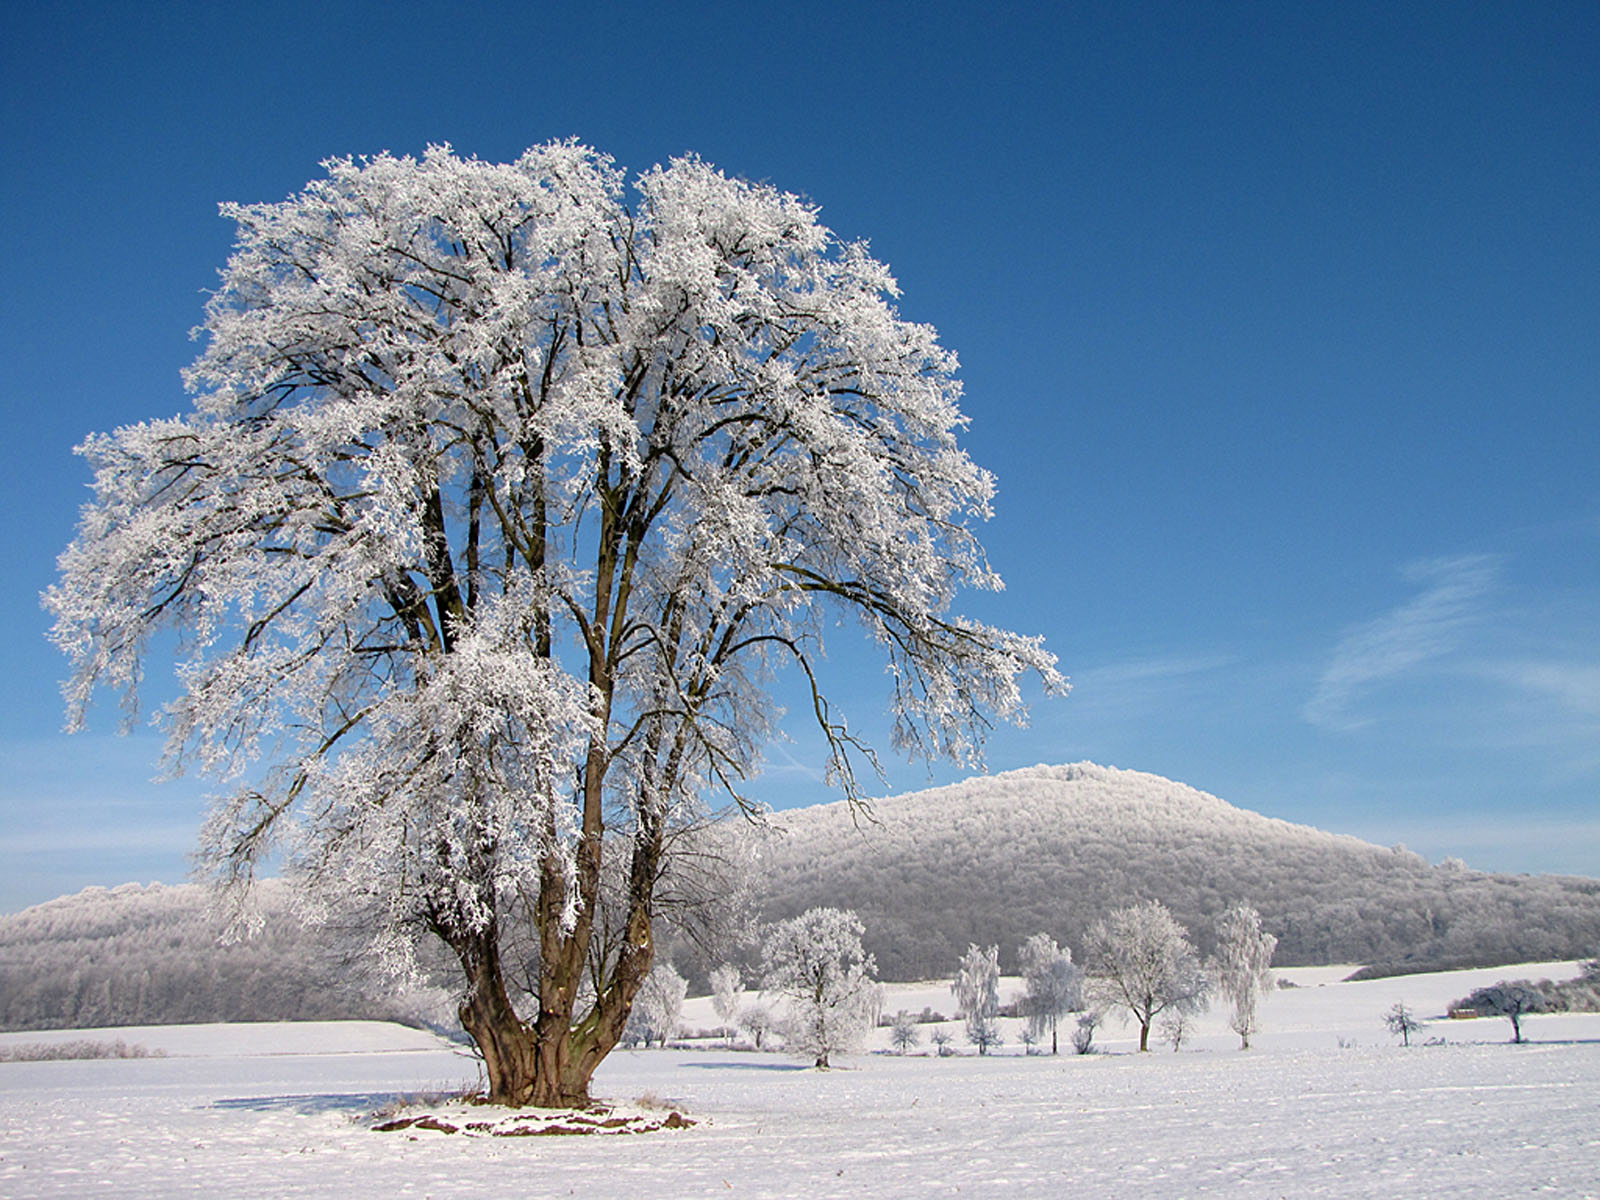 frozen trees widescreen wallpaper - photo #8